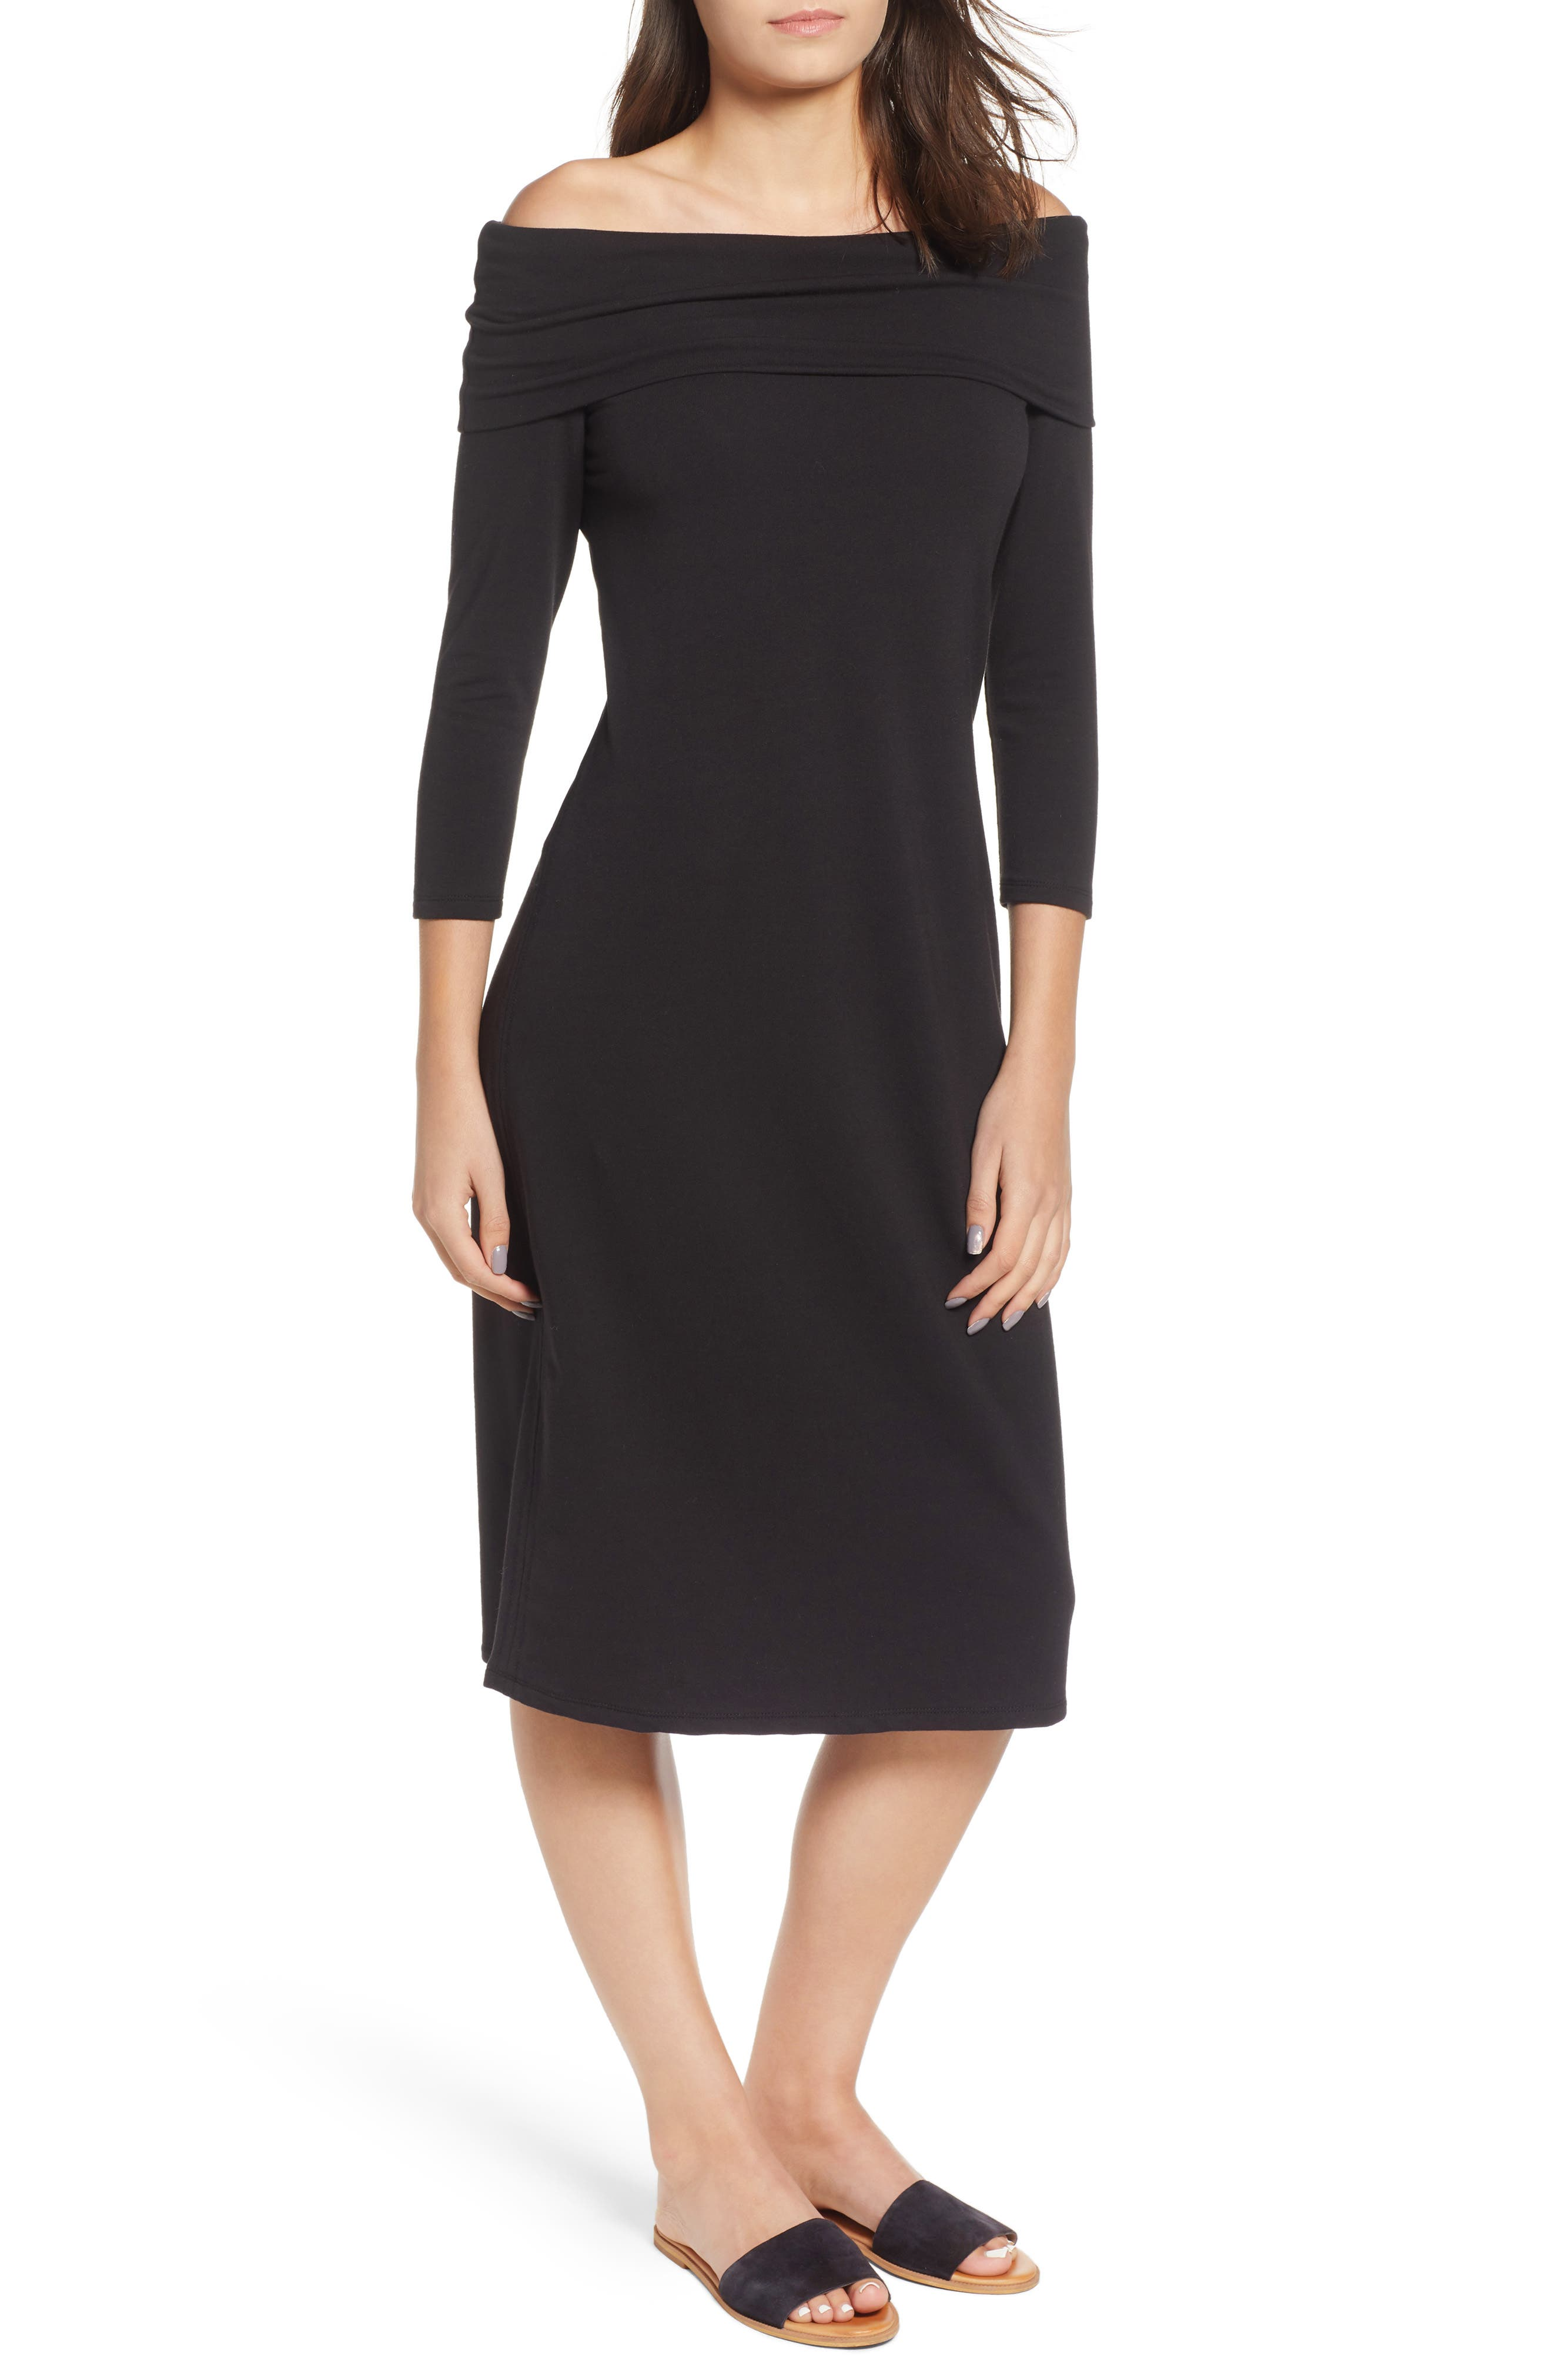 Island Zone Off-The-Shoulder Dress in Black